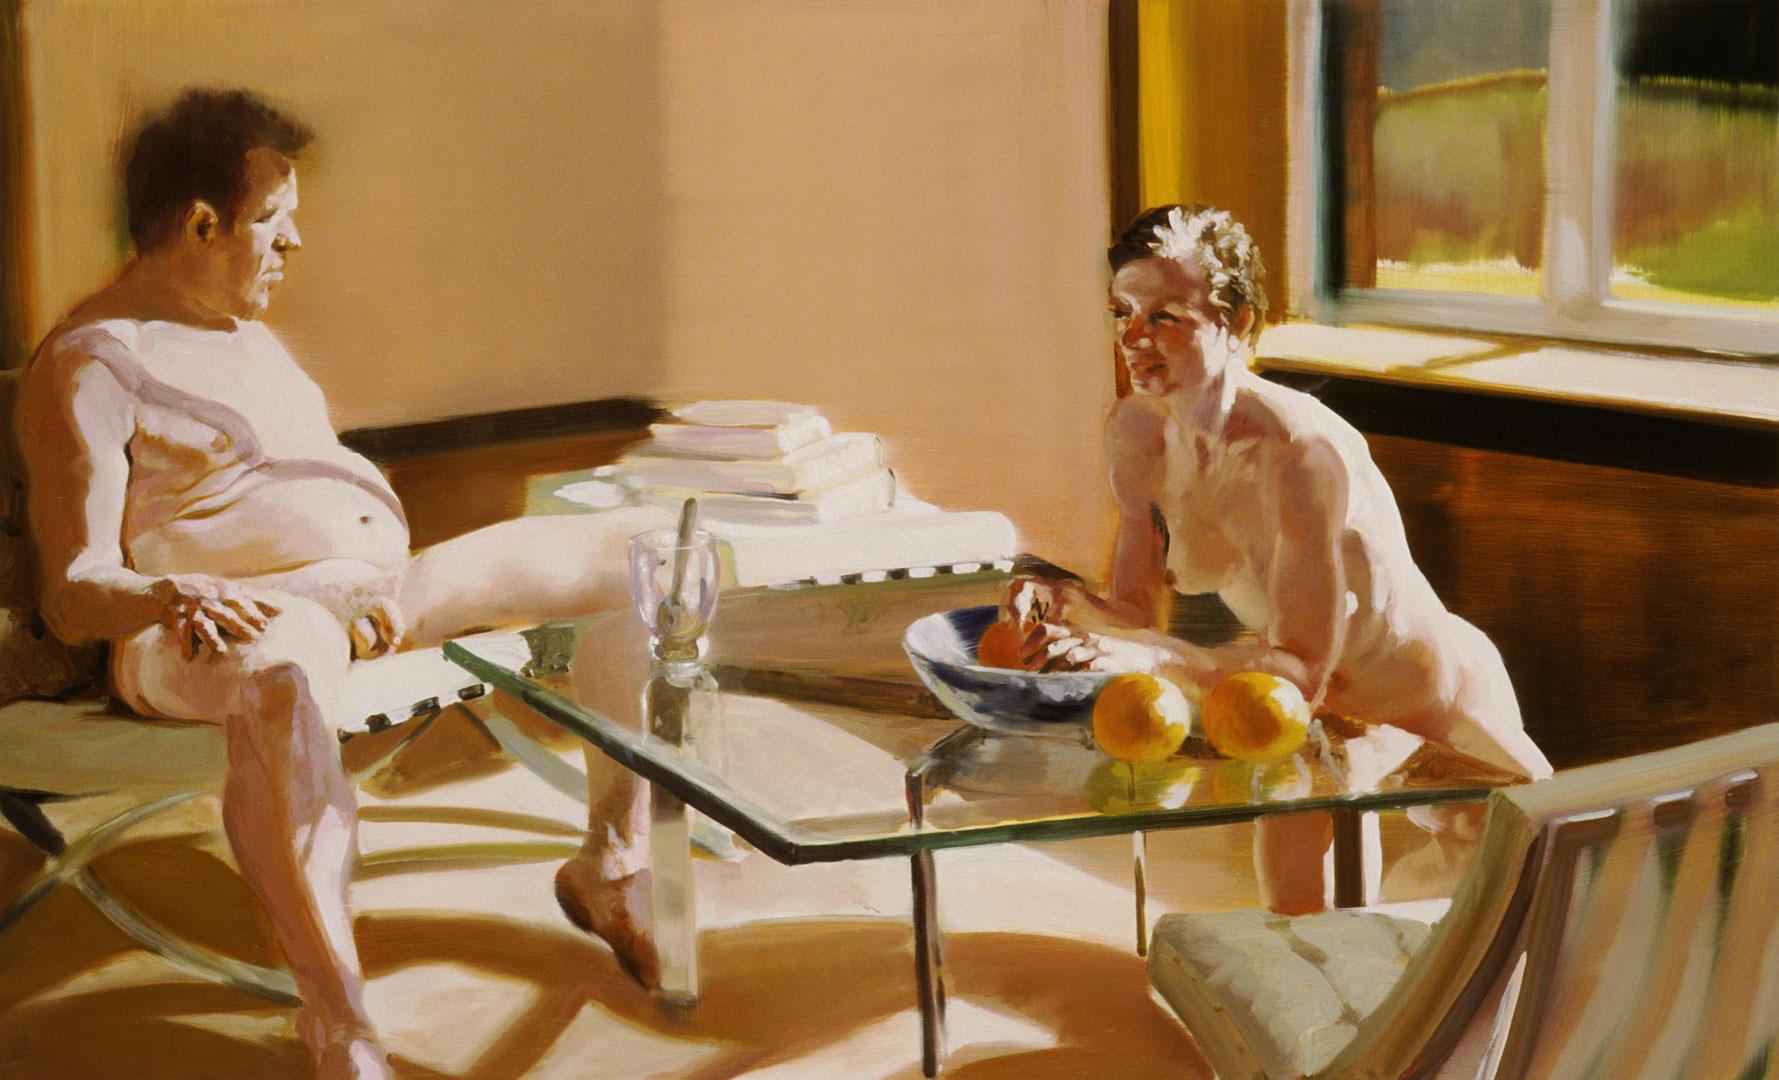 Krefeld Project; Sunroom, Scene #3, 2002. Oil on linen. 40.5 x 65 in. (103 x 165 cm)